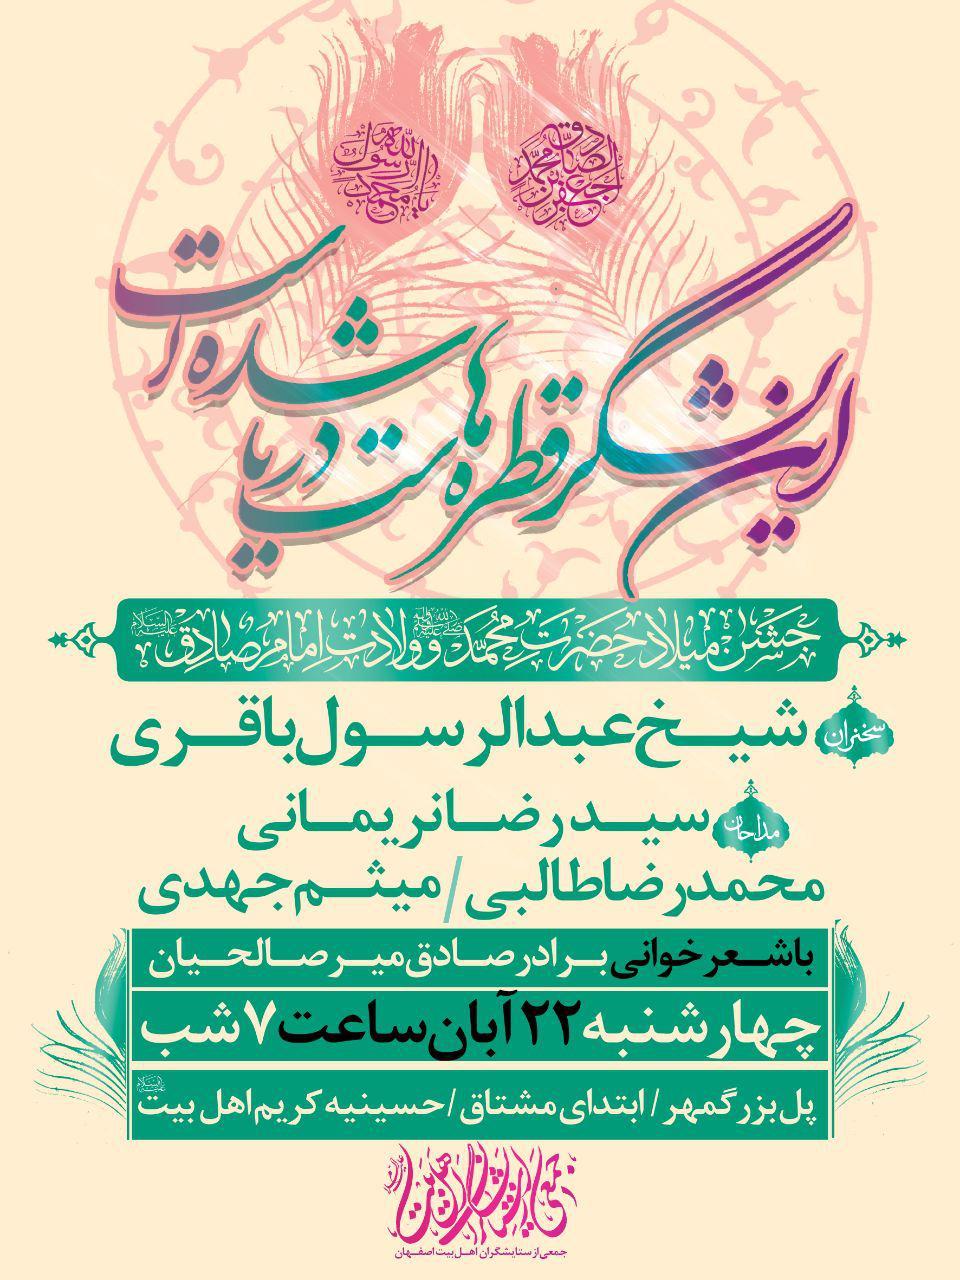 سیدرضانریمانی  میثم جهدی محمدرضاطالبی